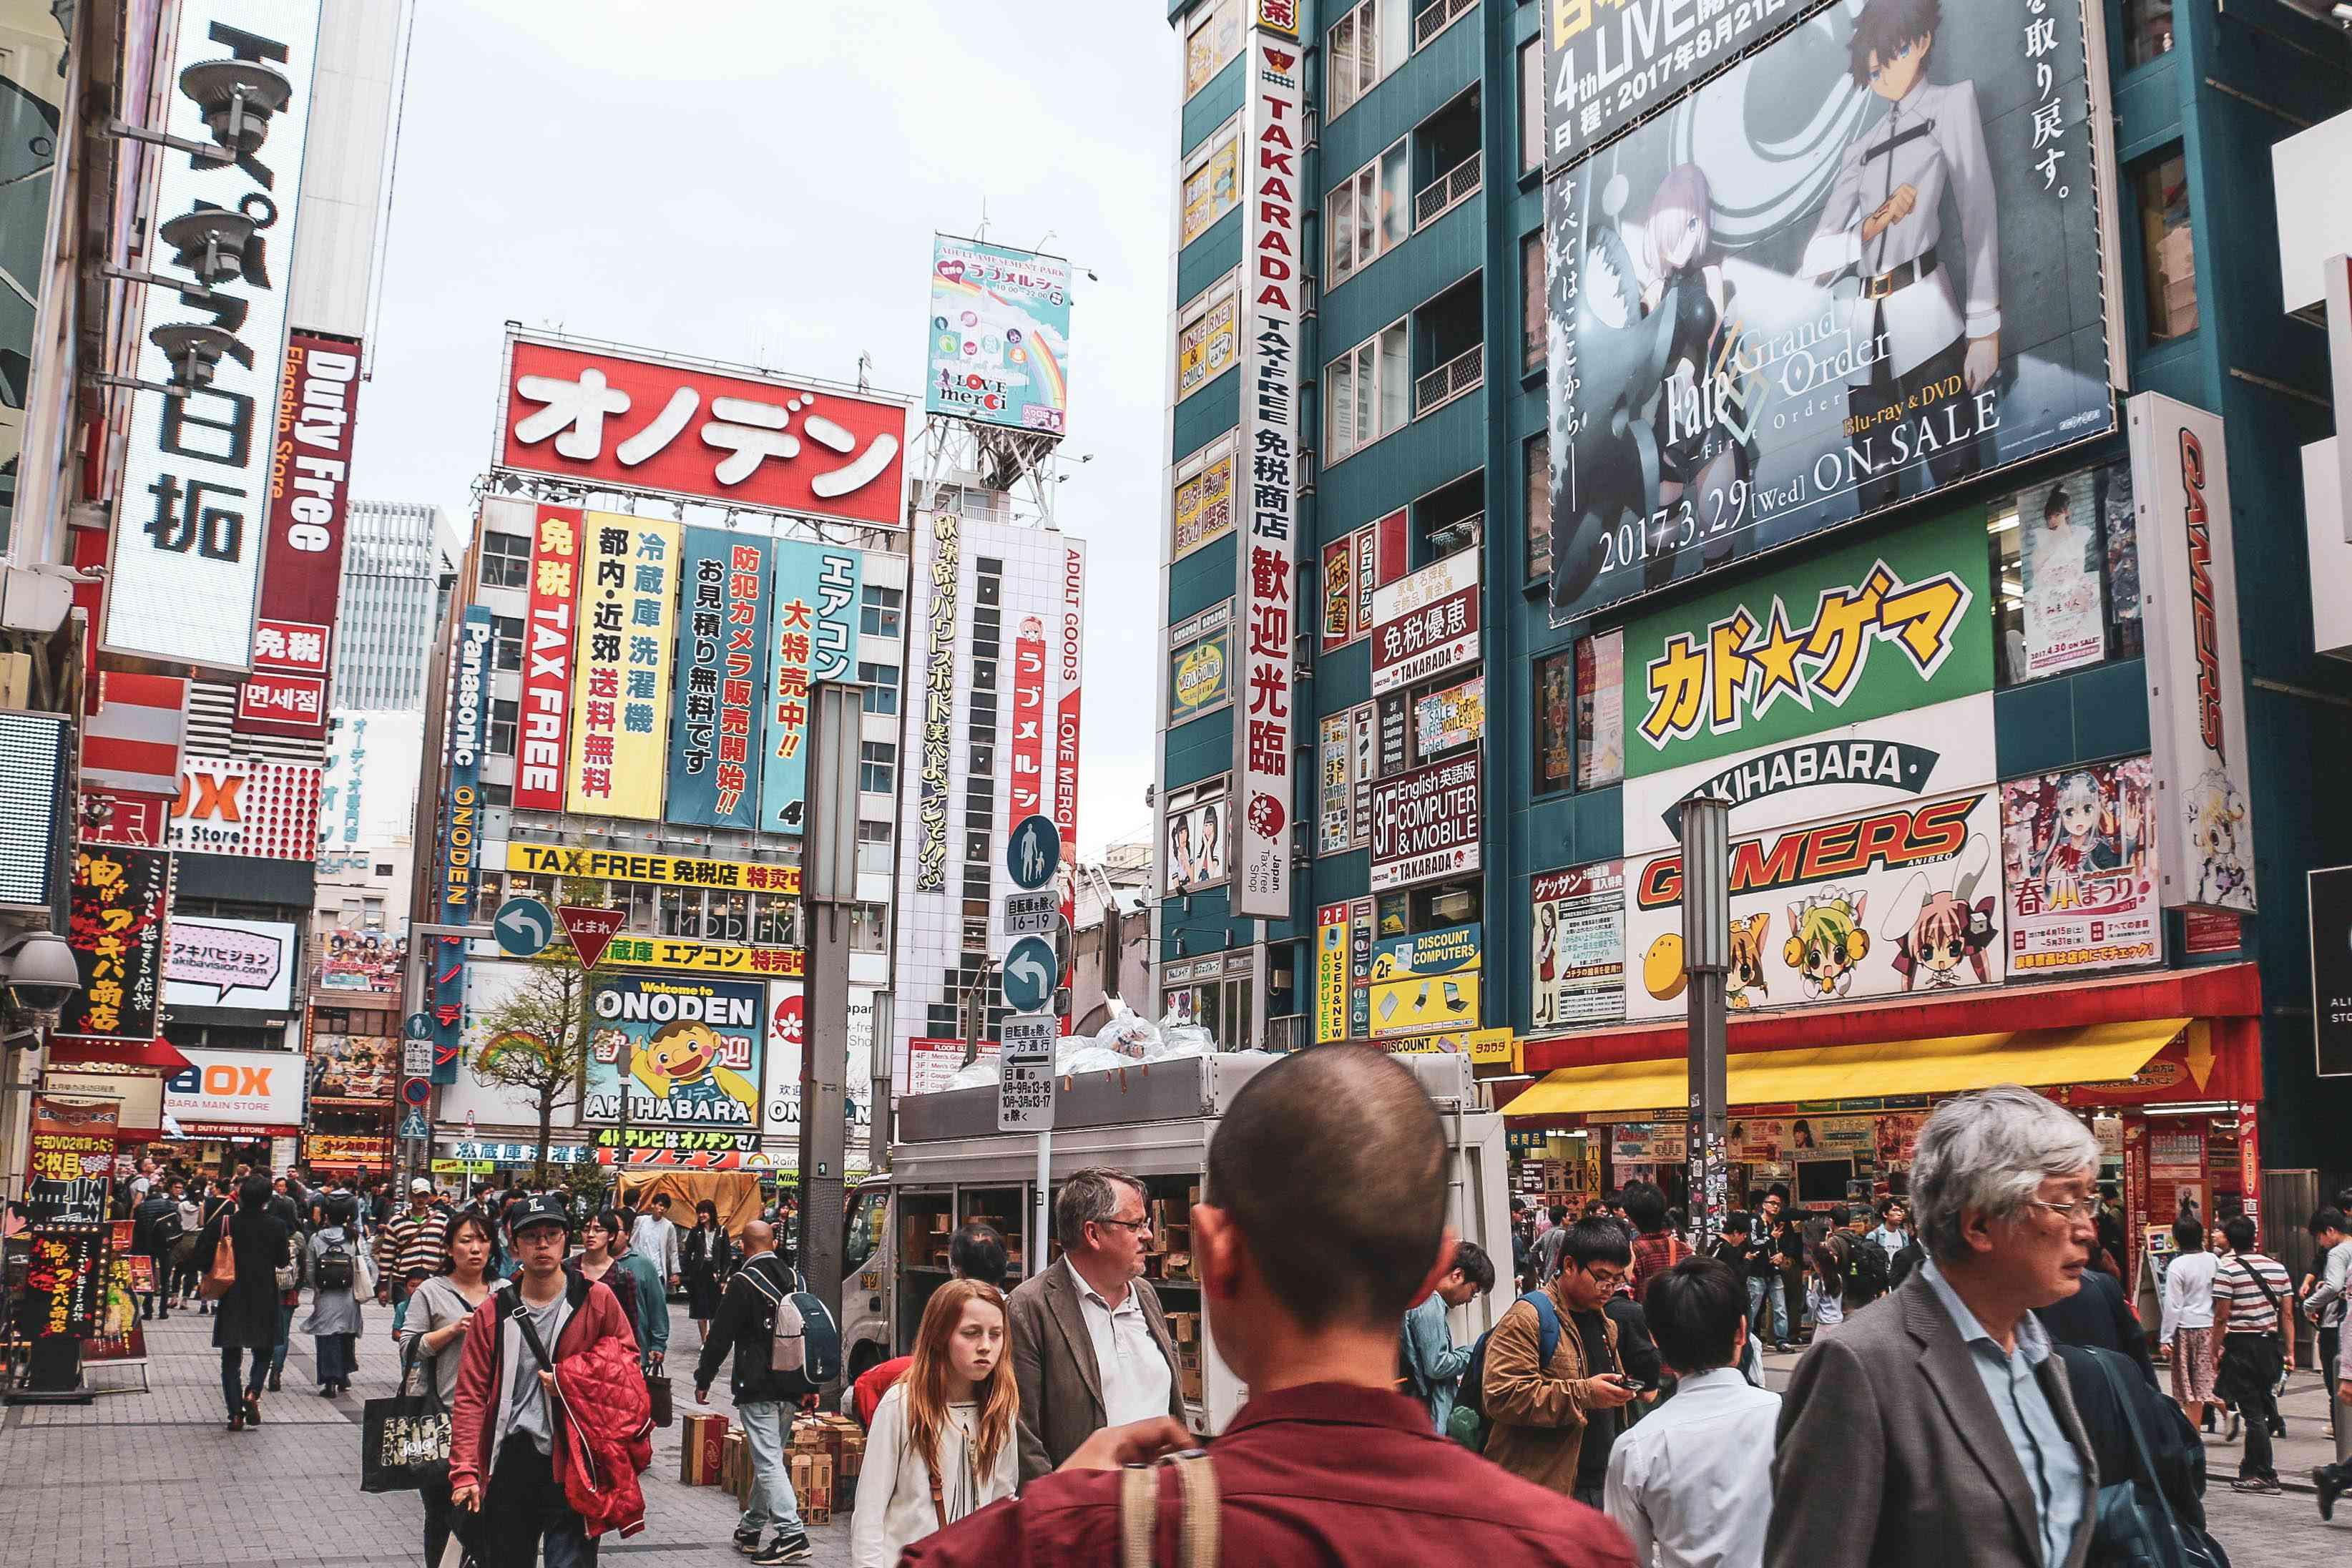 Colorful signs in Akhibara